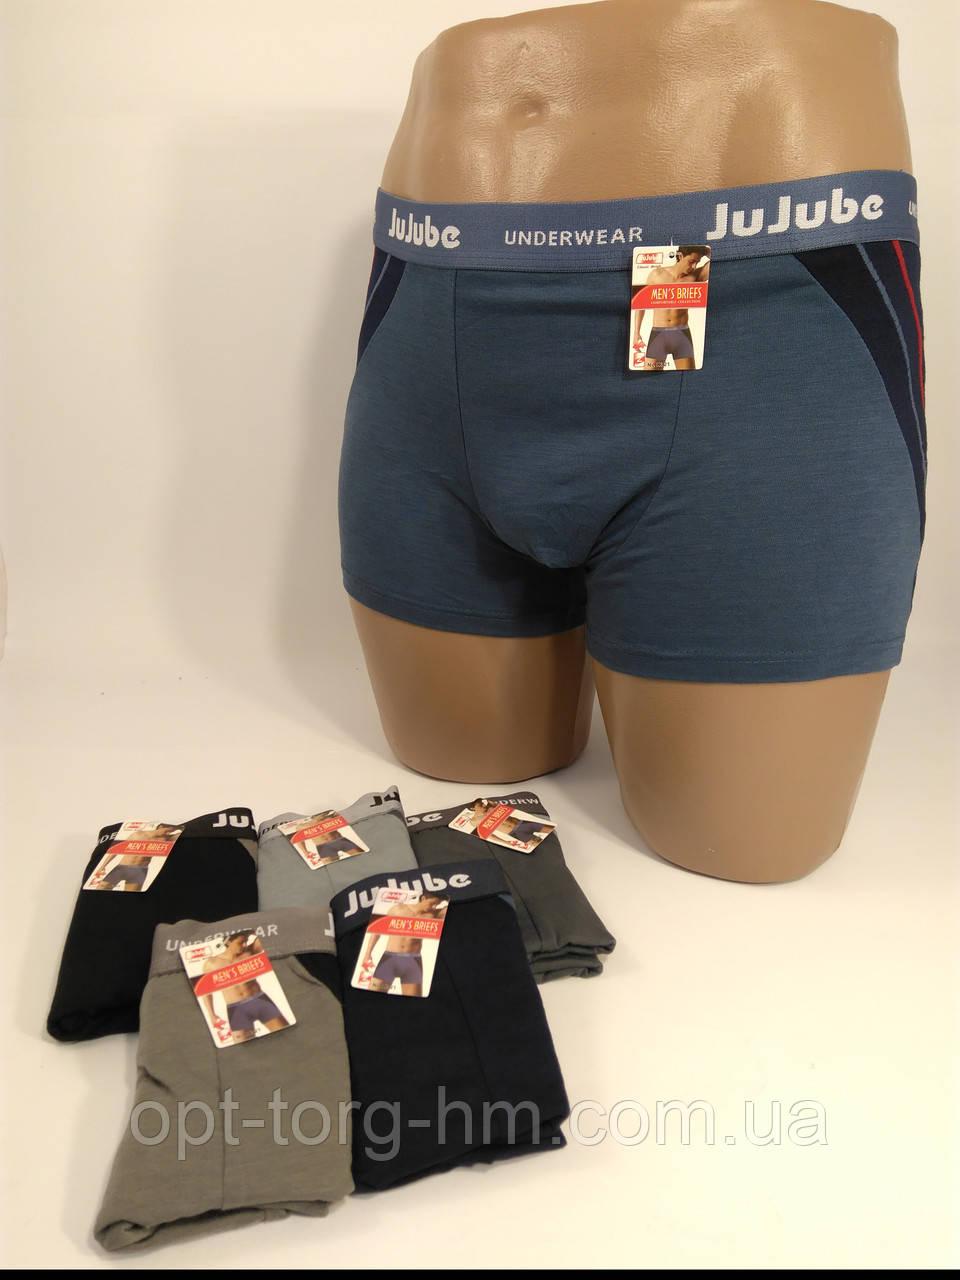 Мужские трусы боксеры JuJuBe Размер 3XL  (Маломерят)